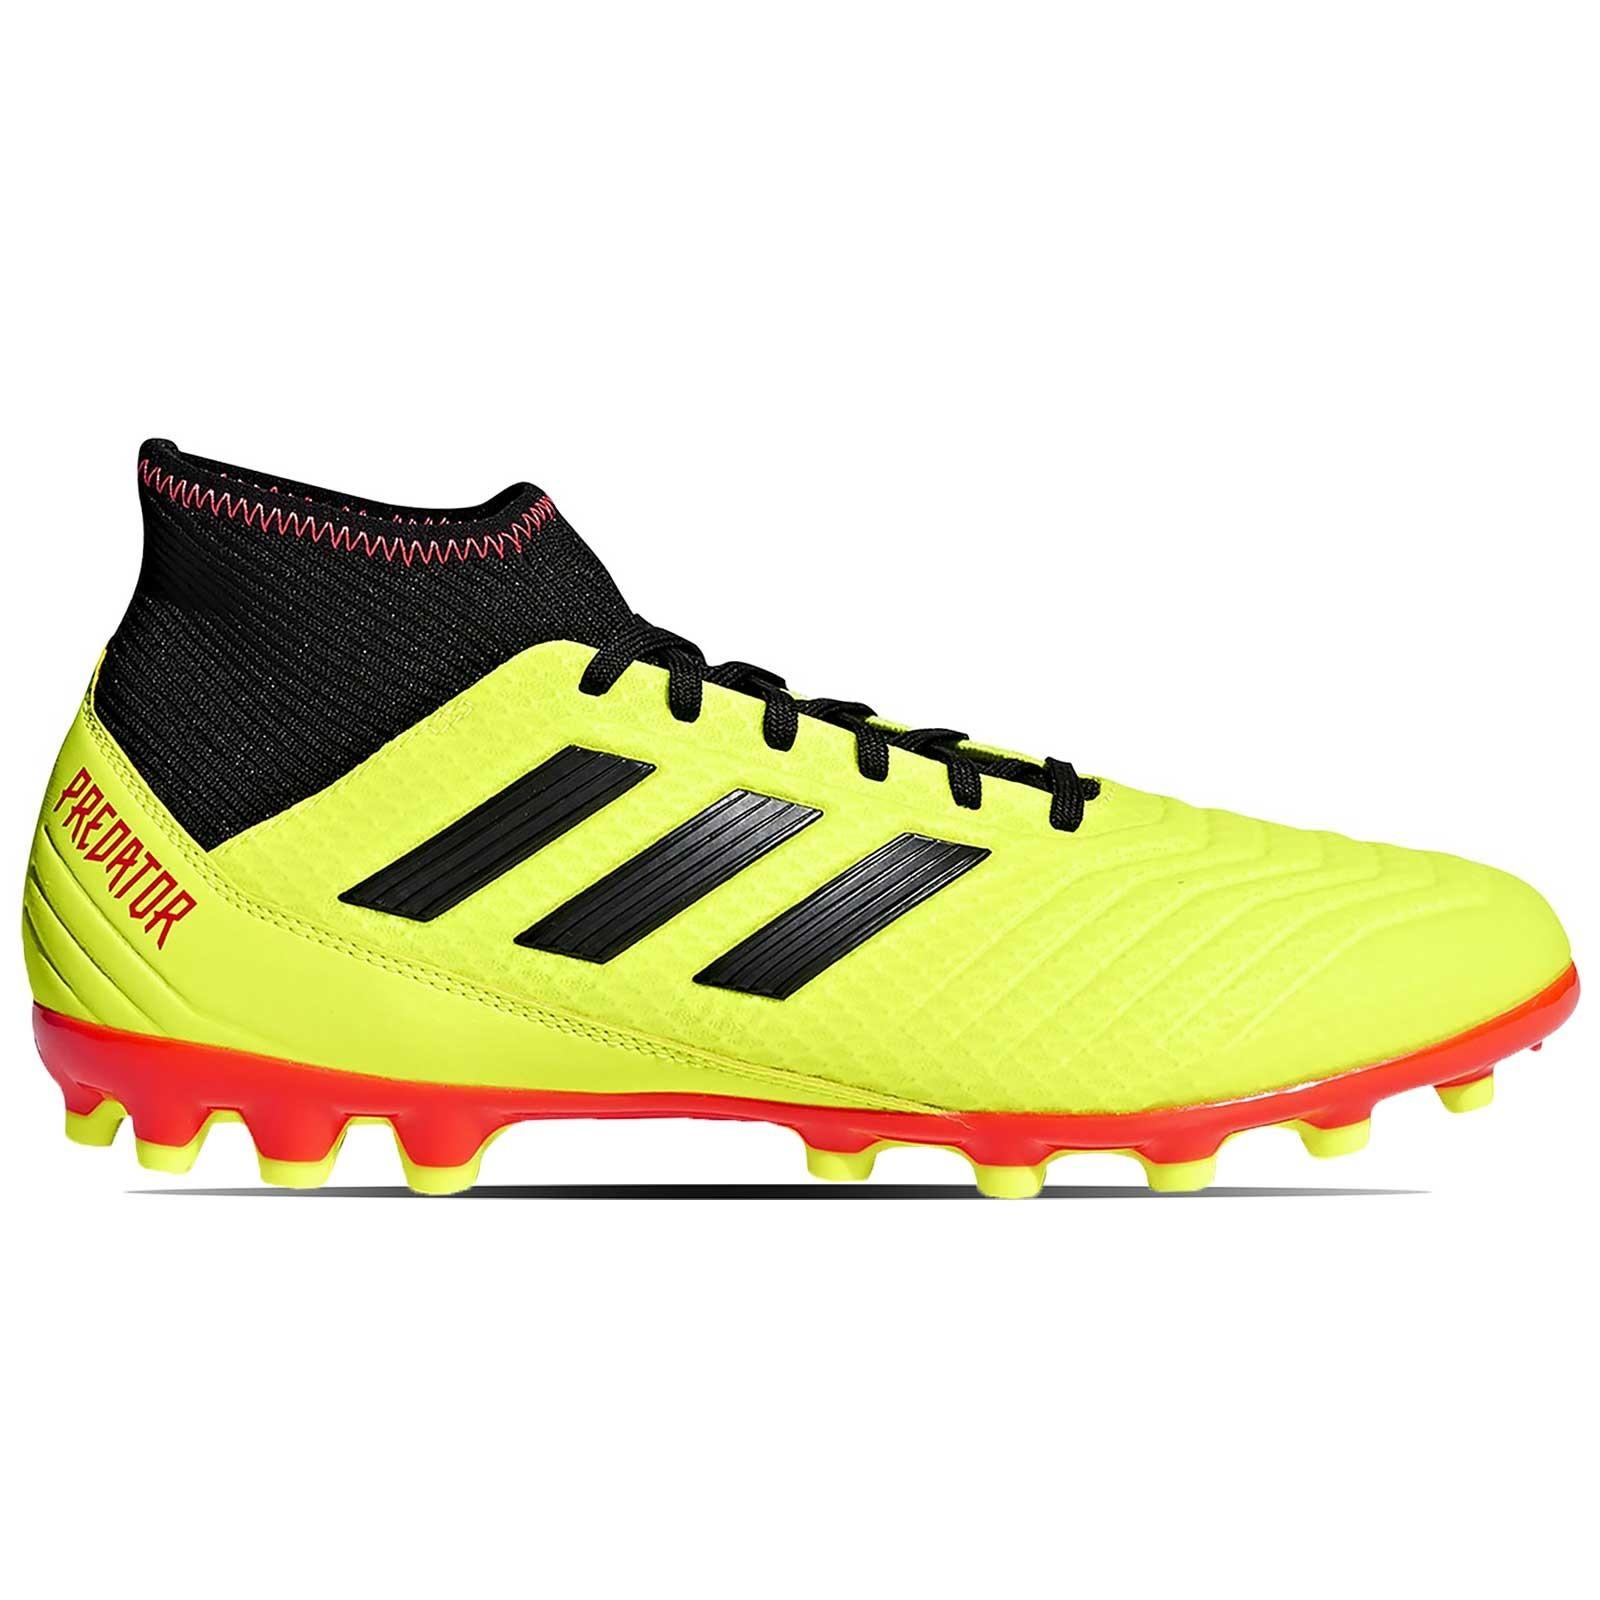 extremidades Calor Nathaniel Ward  Comprar Bota Fútbol adidas Predator 8.3 Ag ¡Mejor Precio!